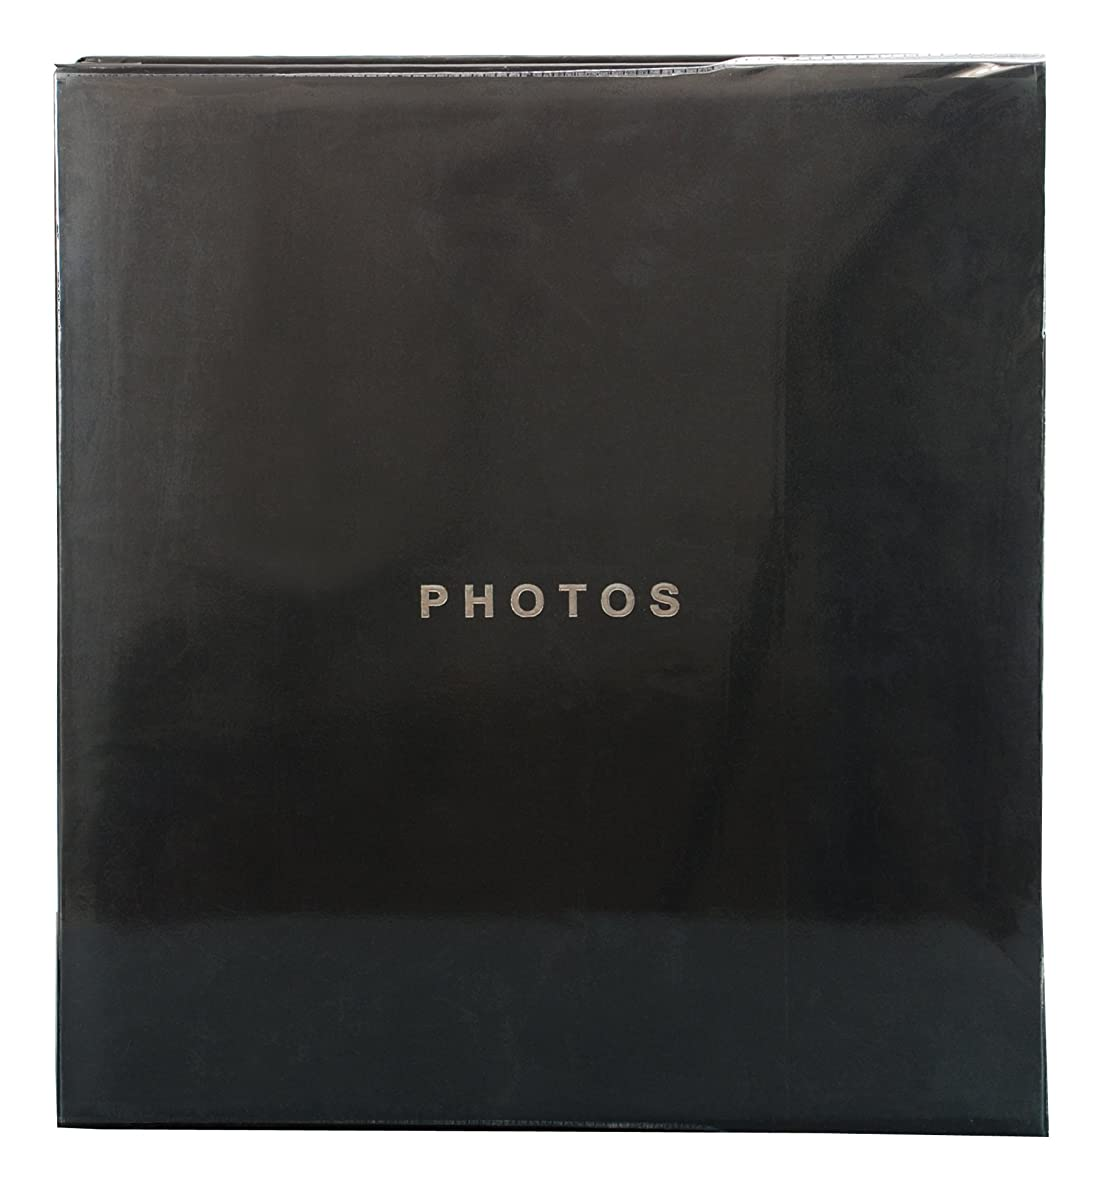 kieragrace KG Jocelyn Photo Album, Holds 400 4 by 6-Inch Photos, Black